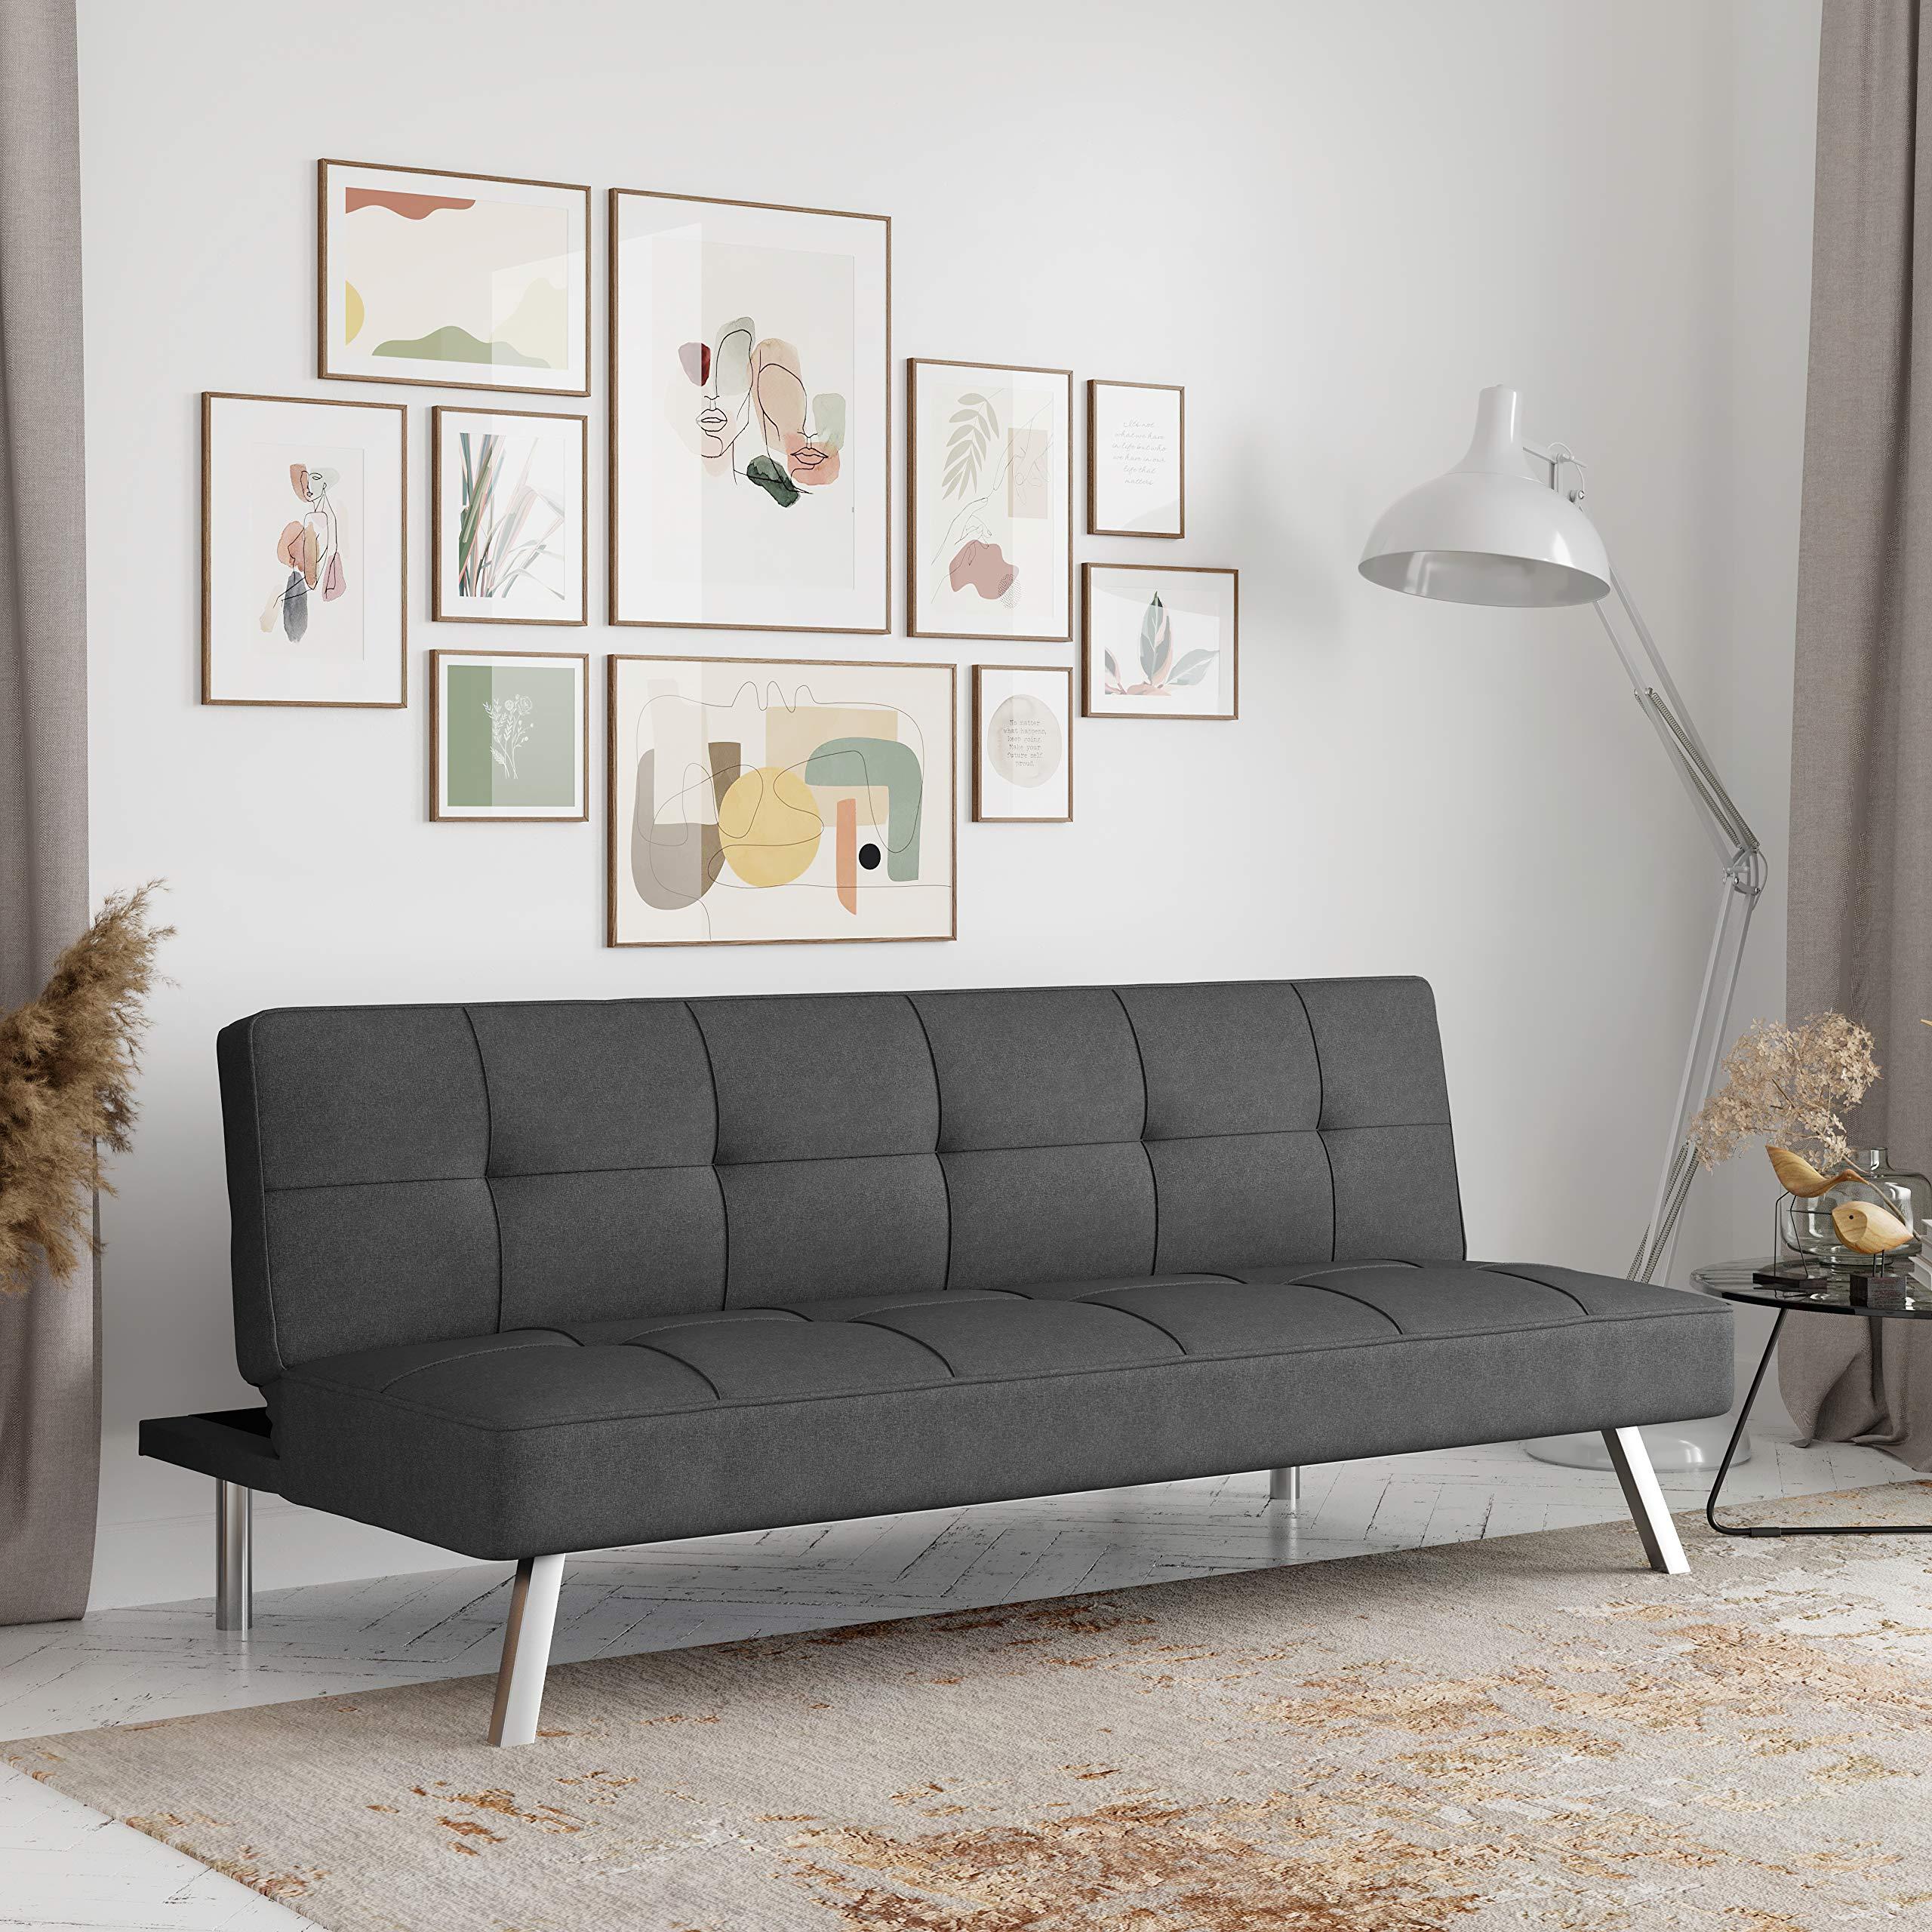 Serta RNE-3S-CC-SET Rane Collection Convertible Sofa, Charcoal